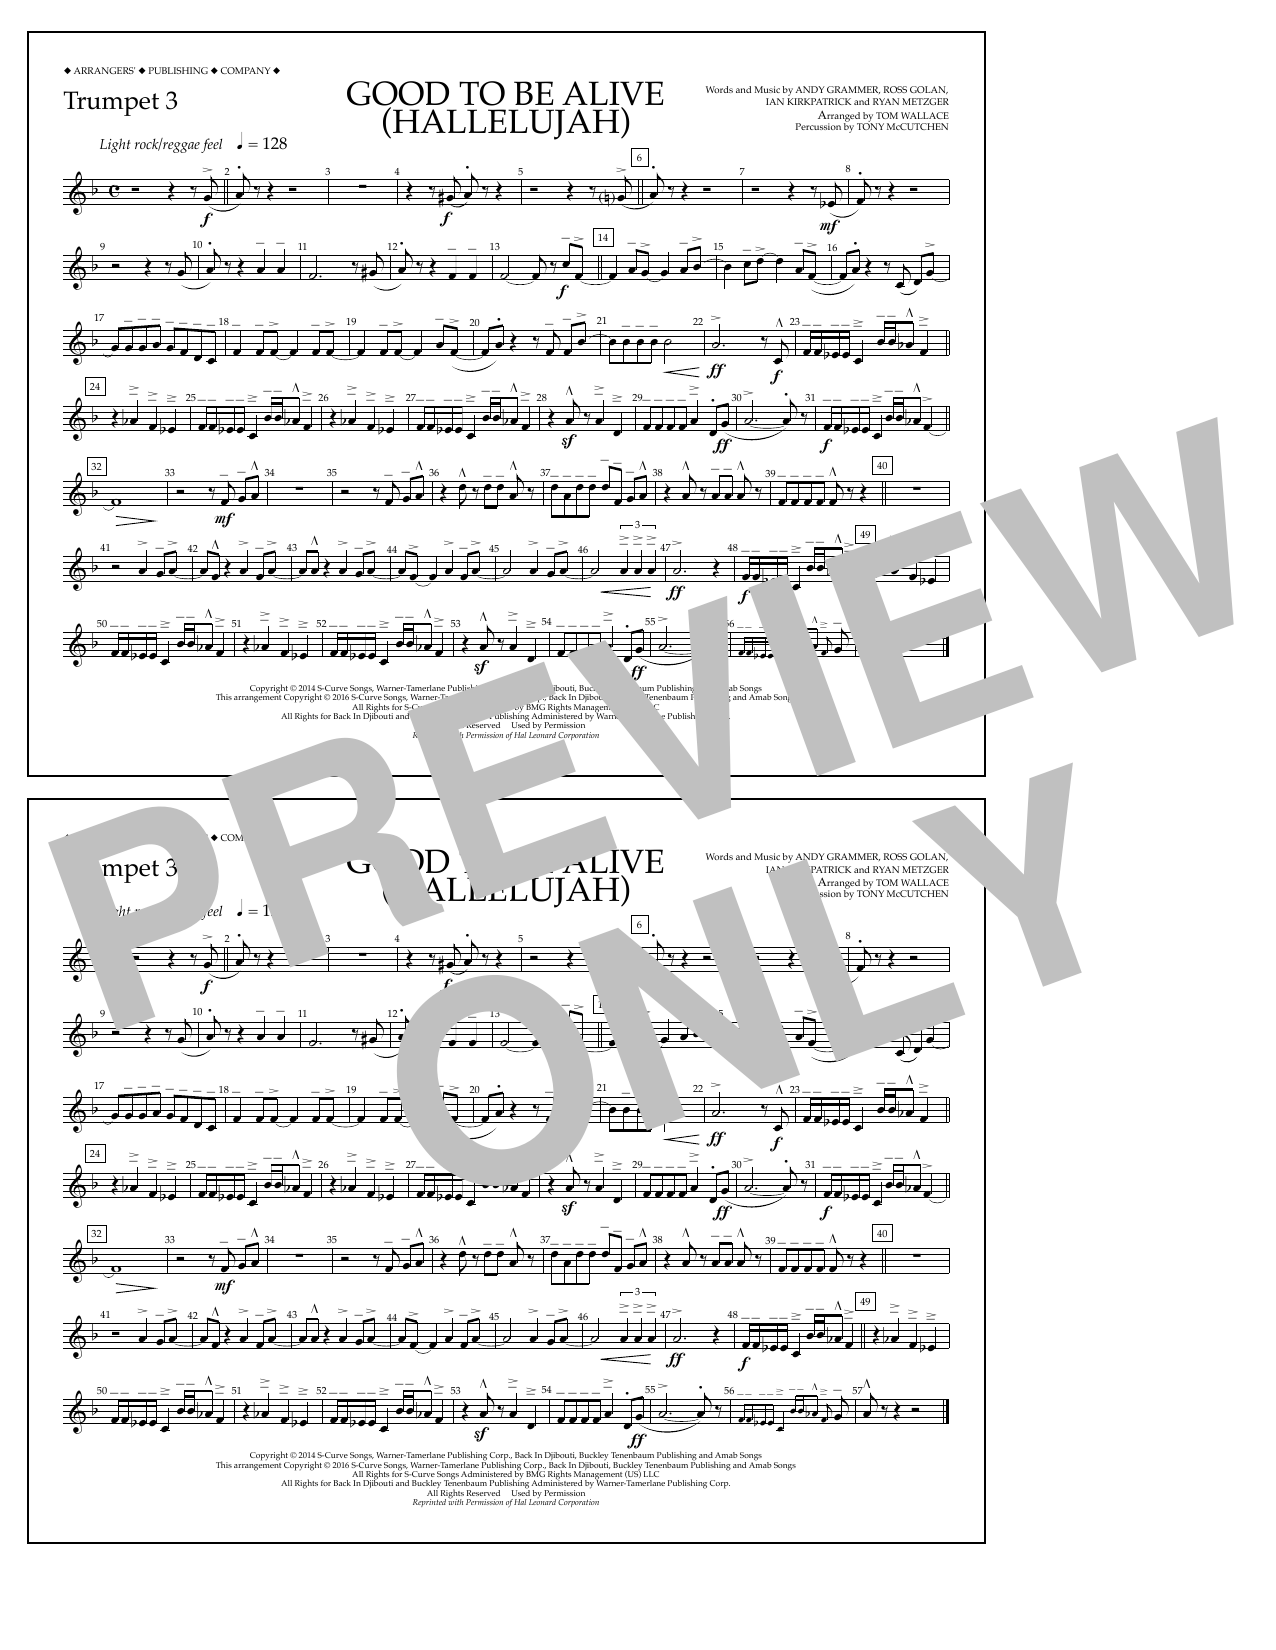 Good to Be Alive (Hallelujah) - Trumpet 3 Sheet Music